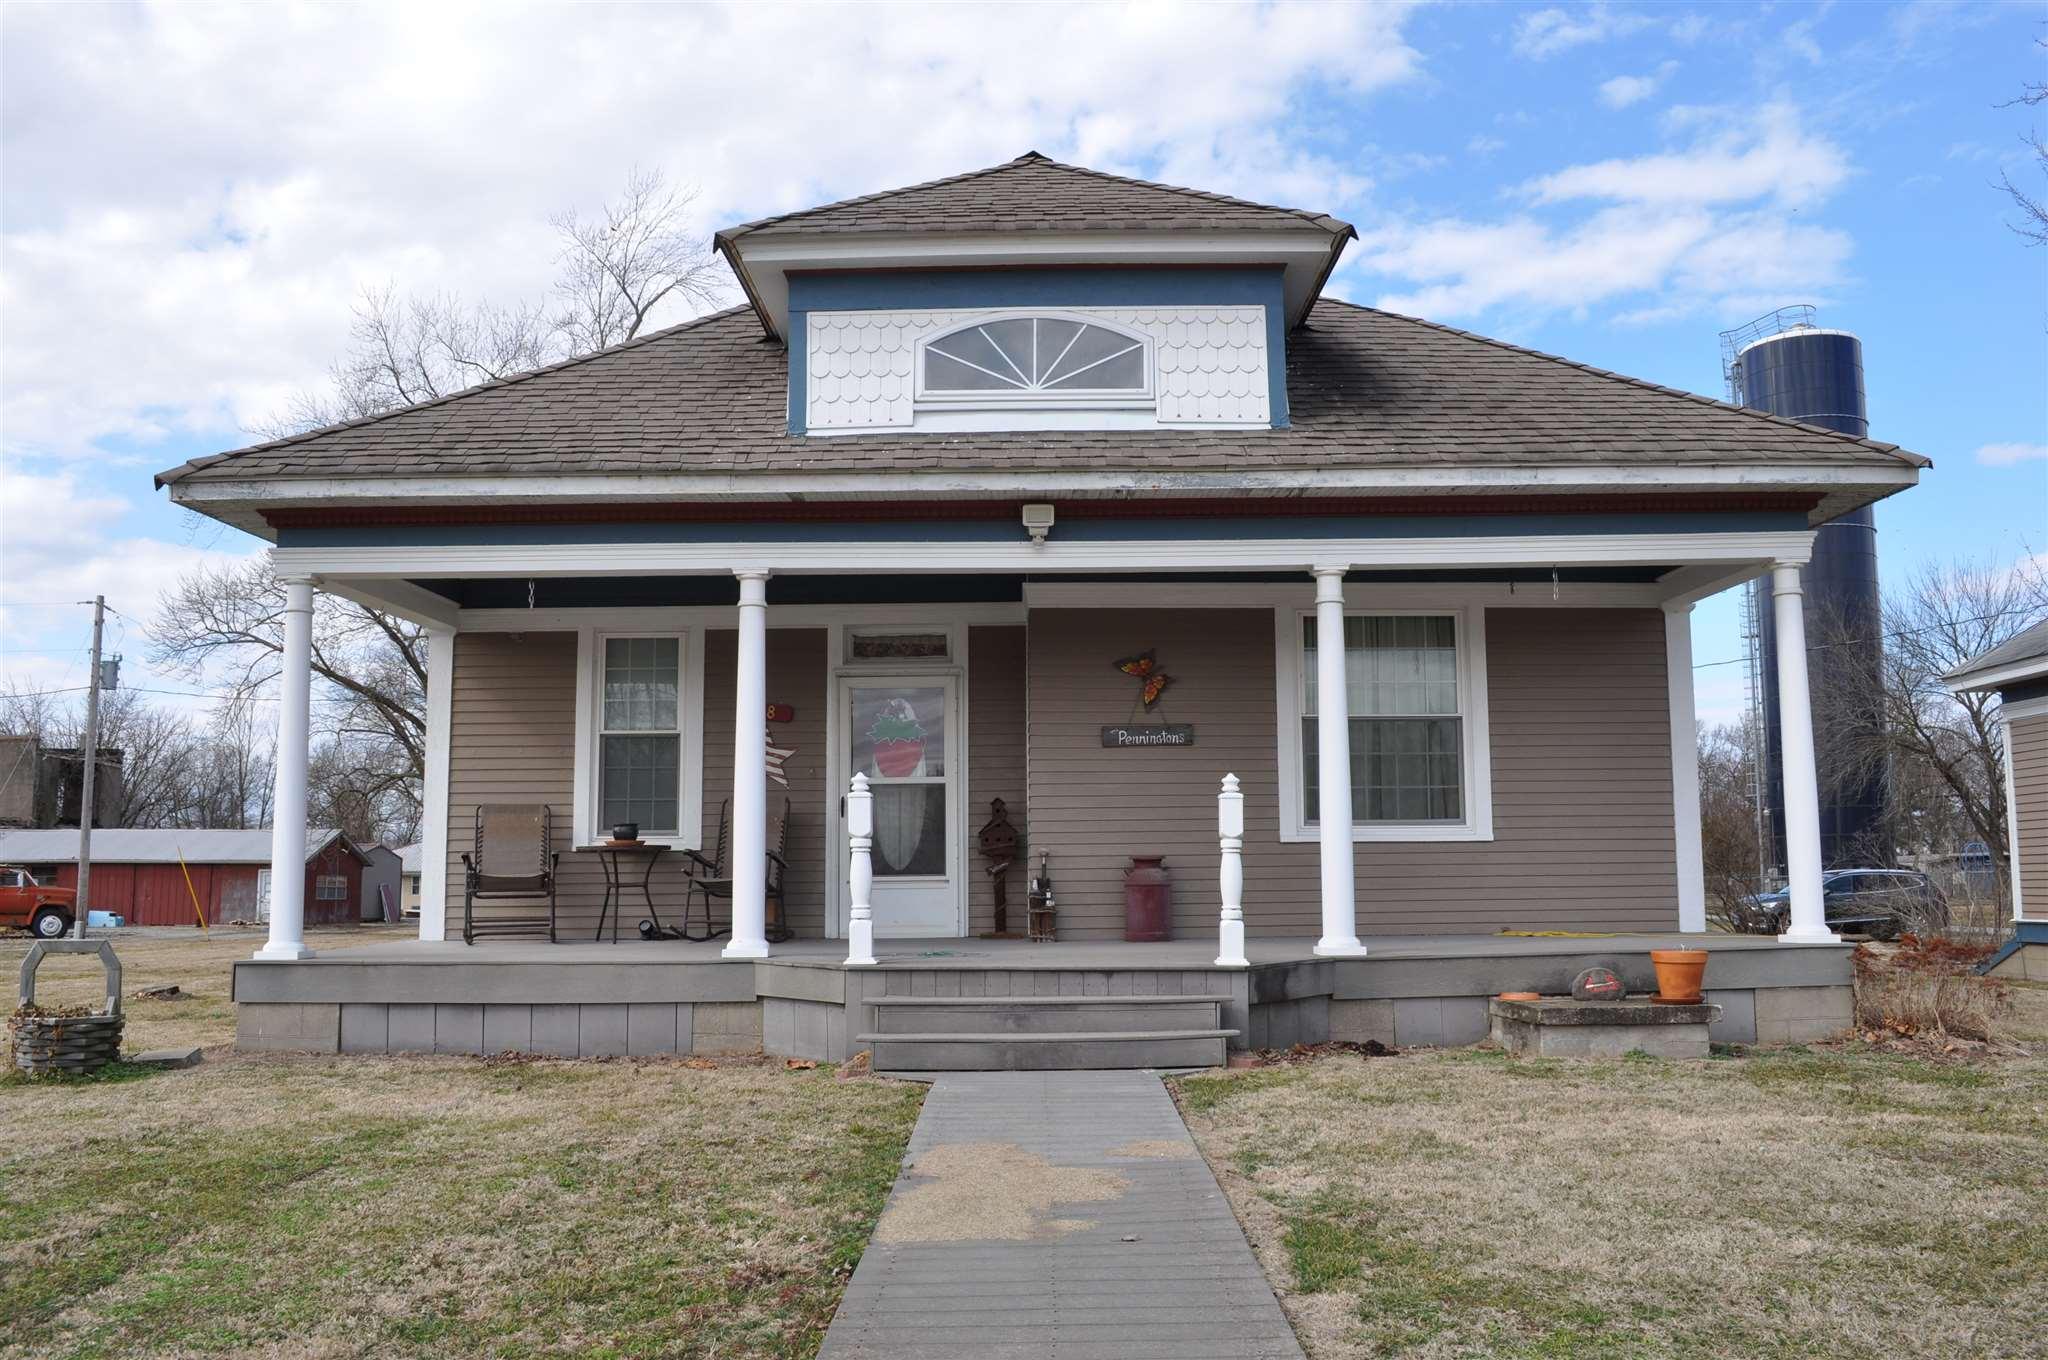 118 N WASHINGTON Property Photo - Geff, IL real estate listing